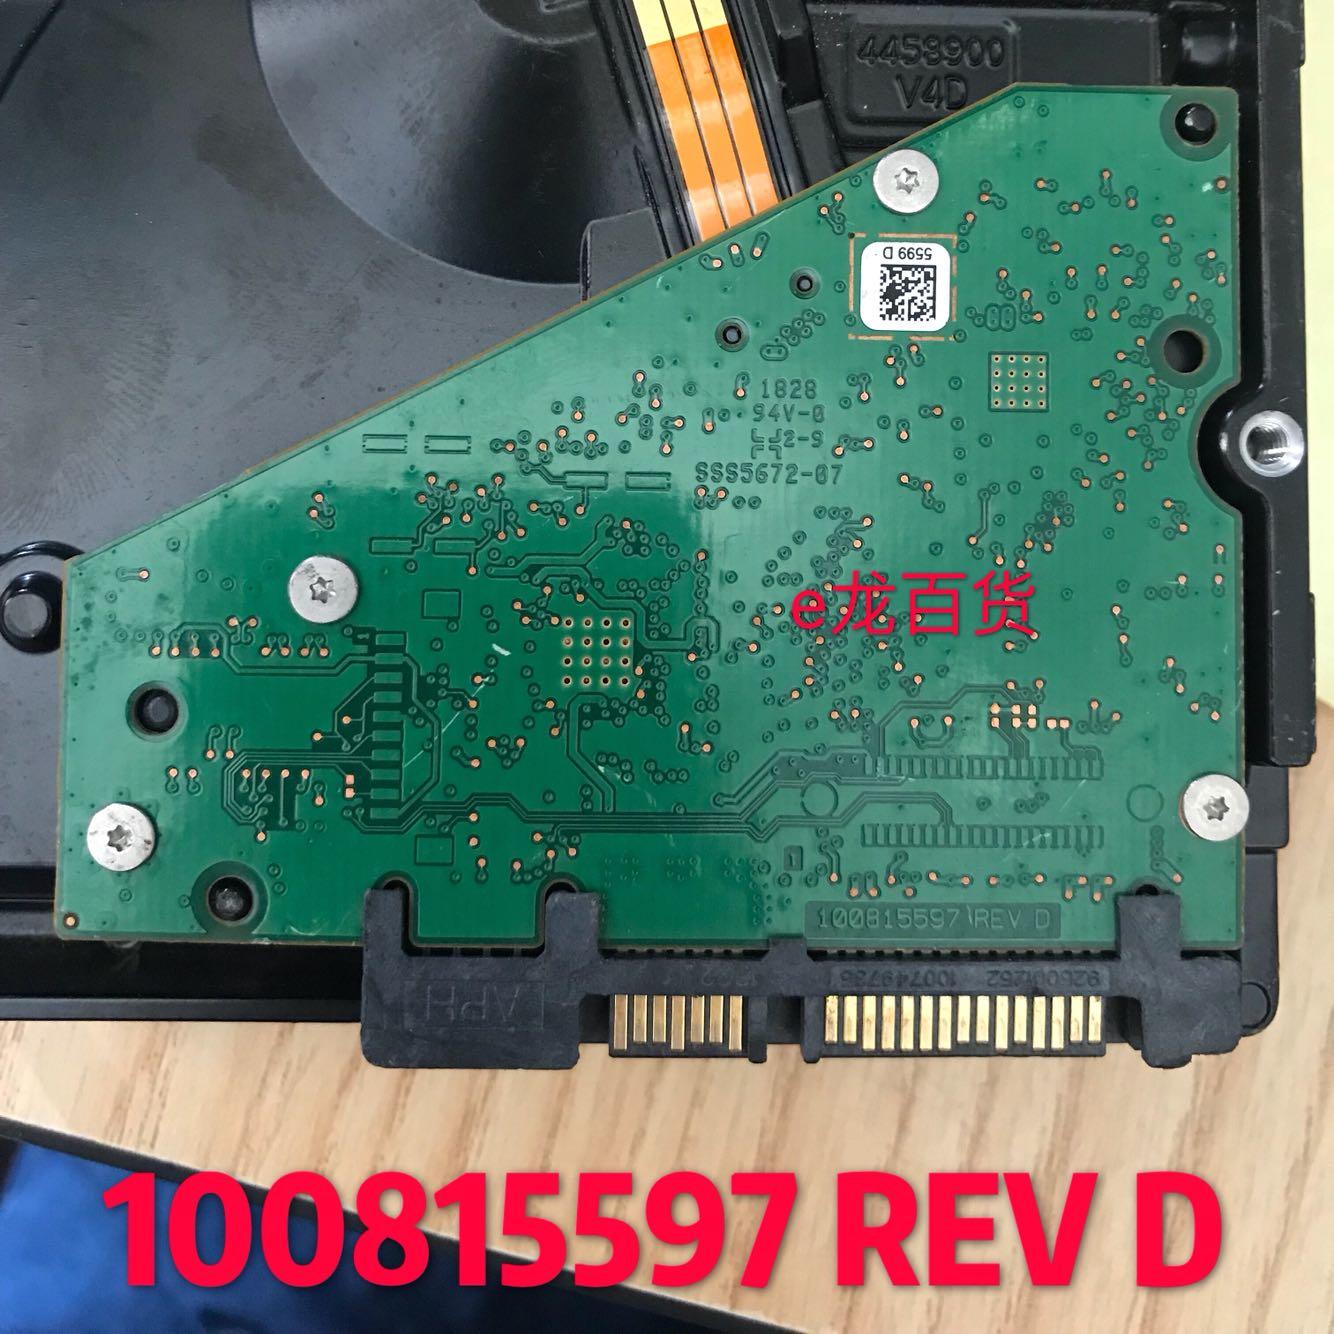 ST HDD PCB para SEAGATE/Logic Board/Board número 100815597 disco duro recuperación de datos de reparación